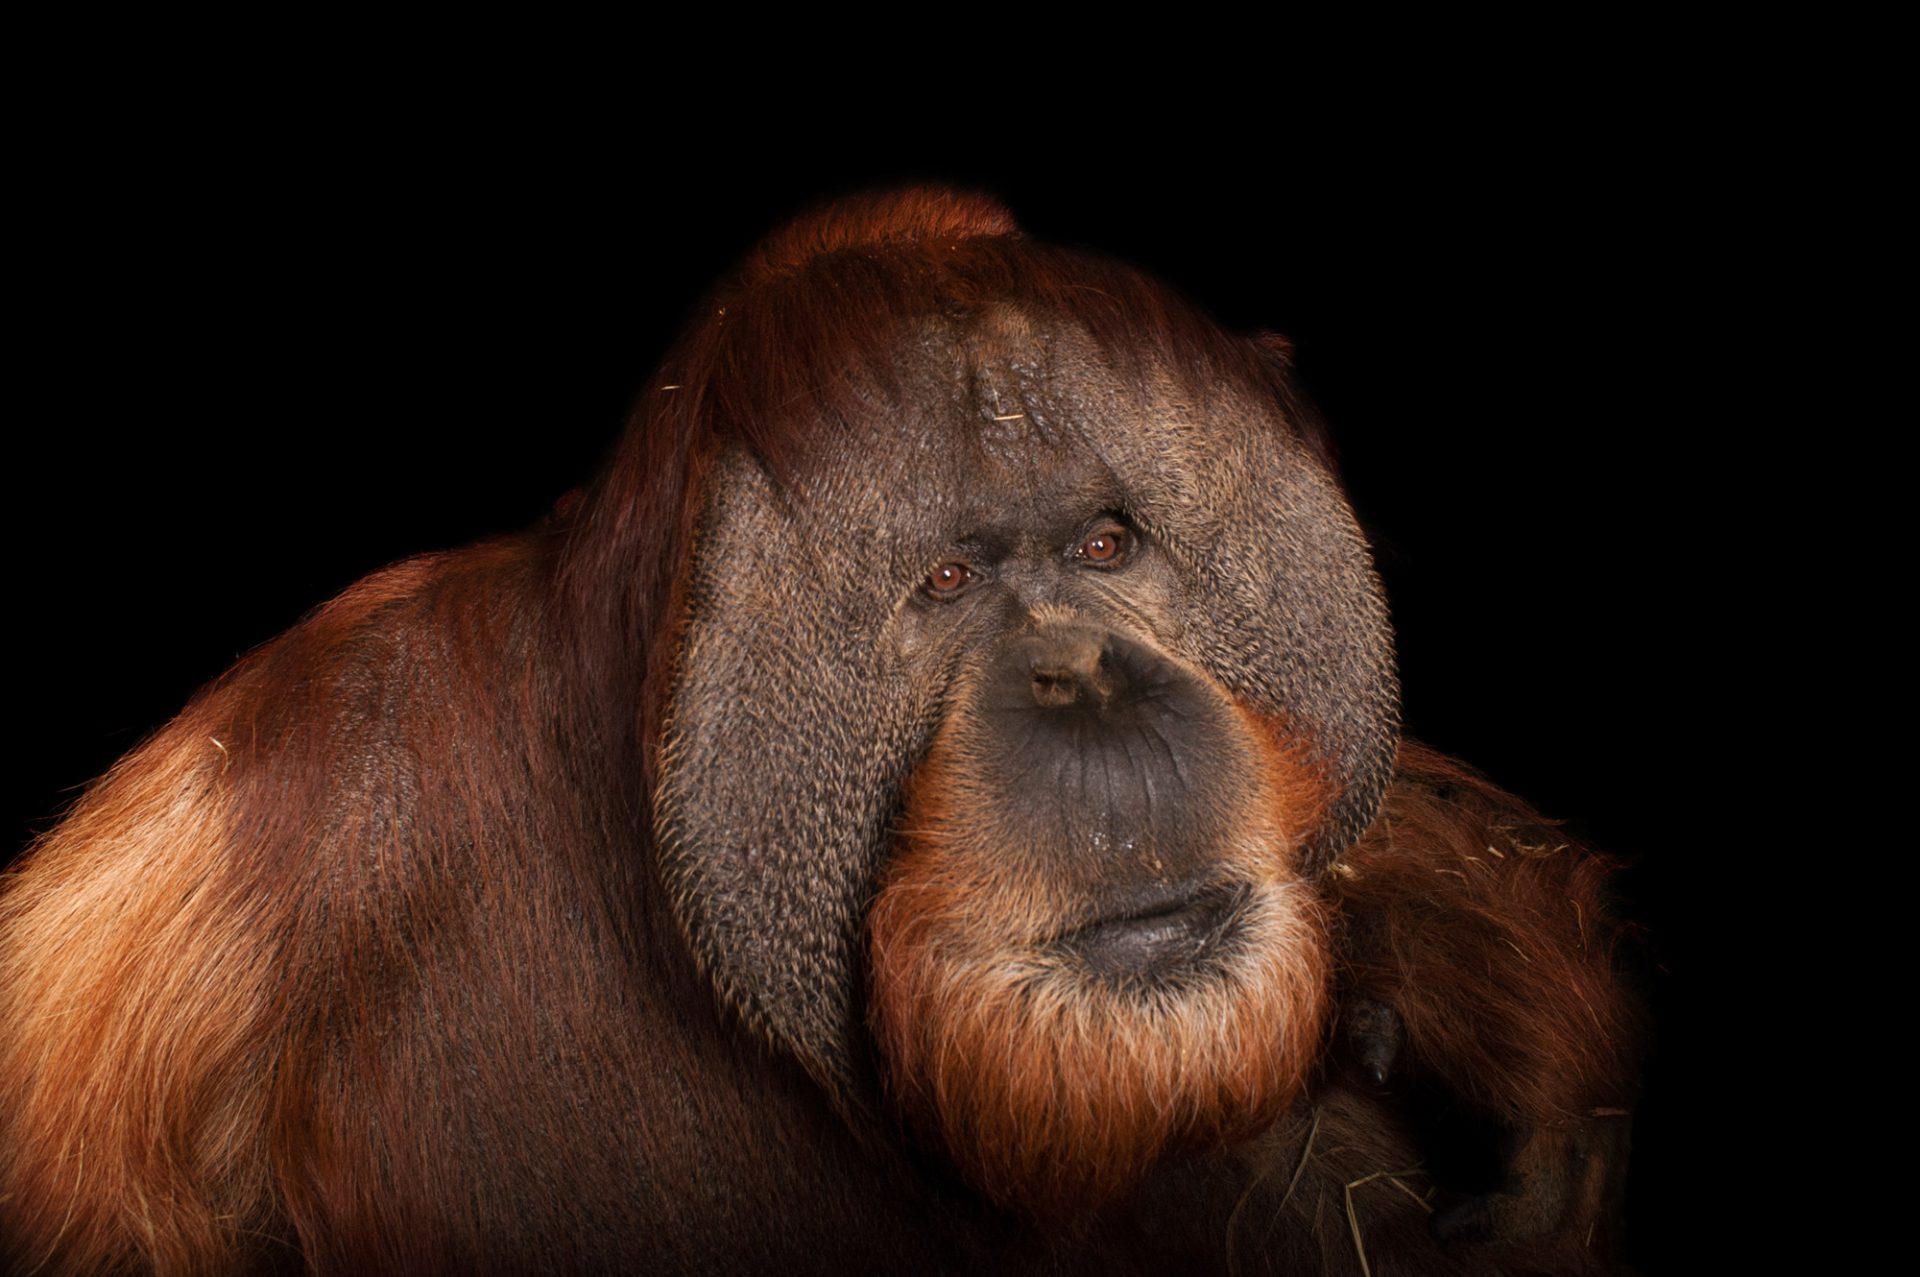 A critically endangered, male Sumatran orangutan, Pongo abelii, at Rolling Hills Wildlife Adventure.